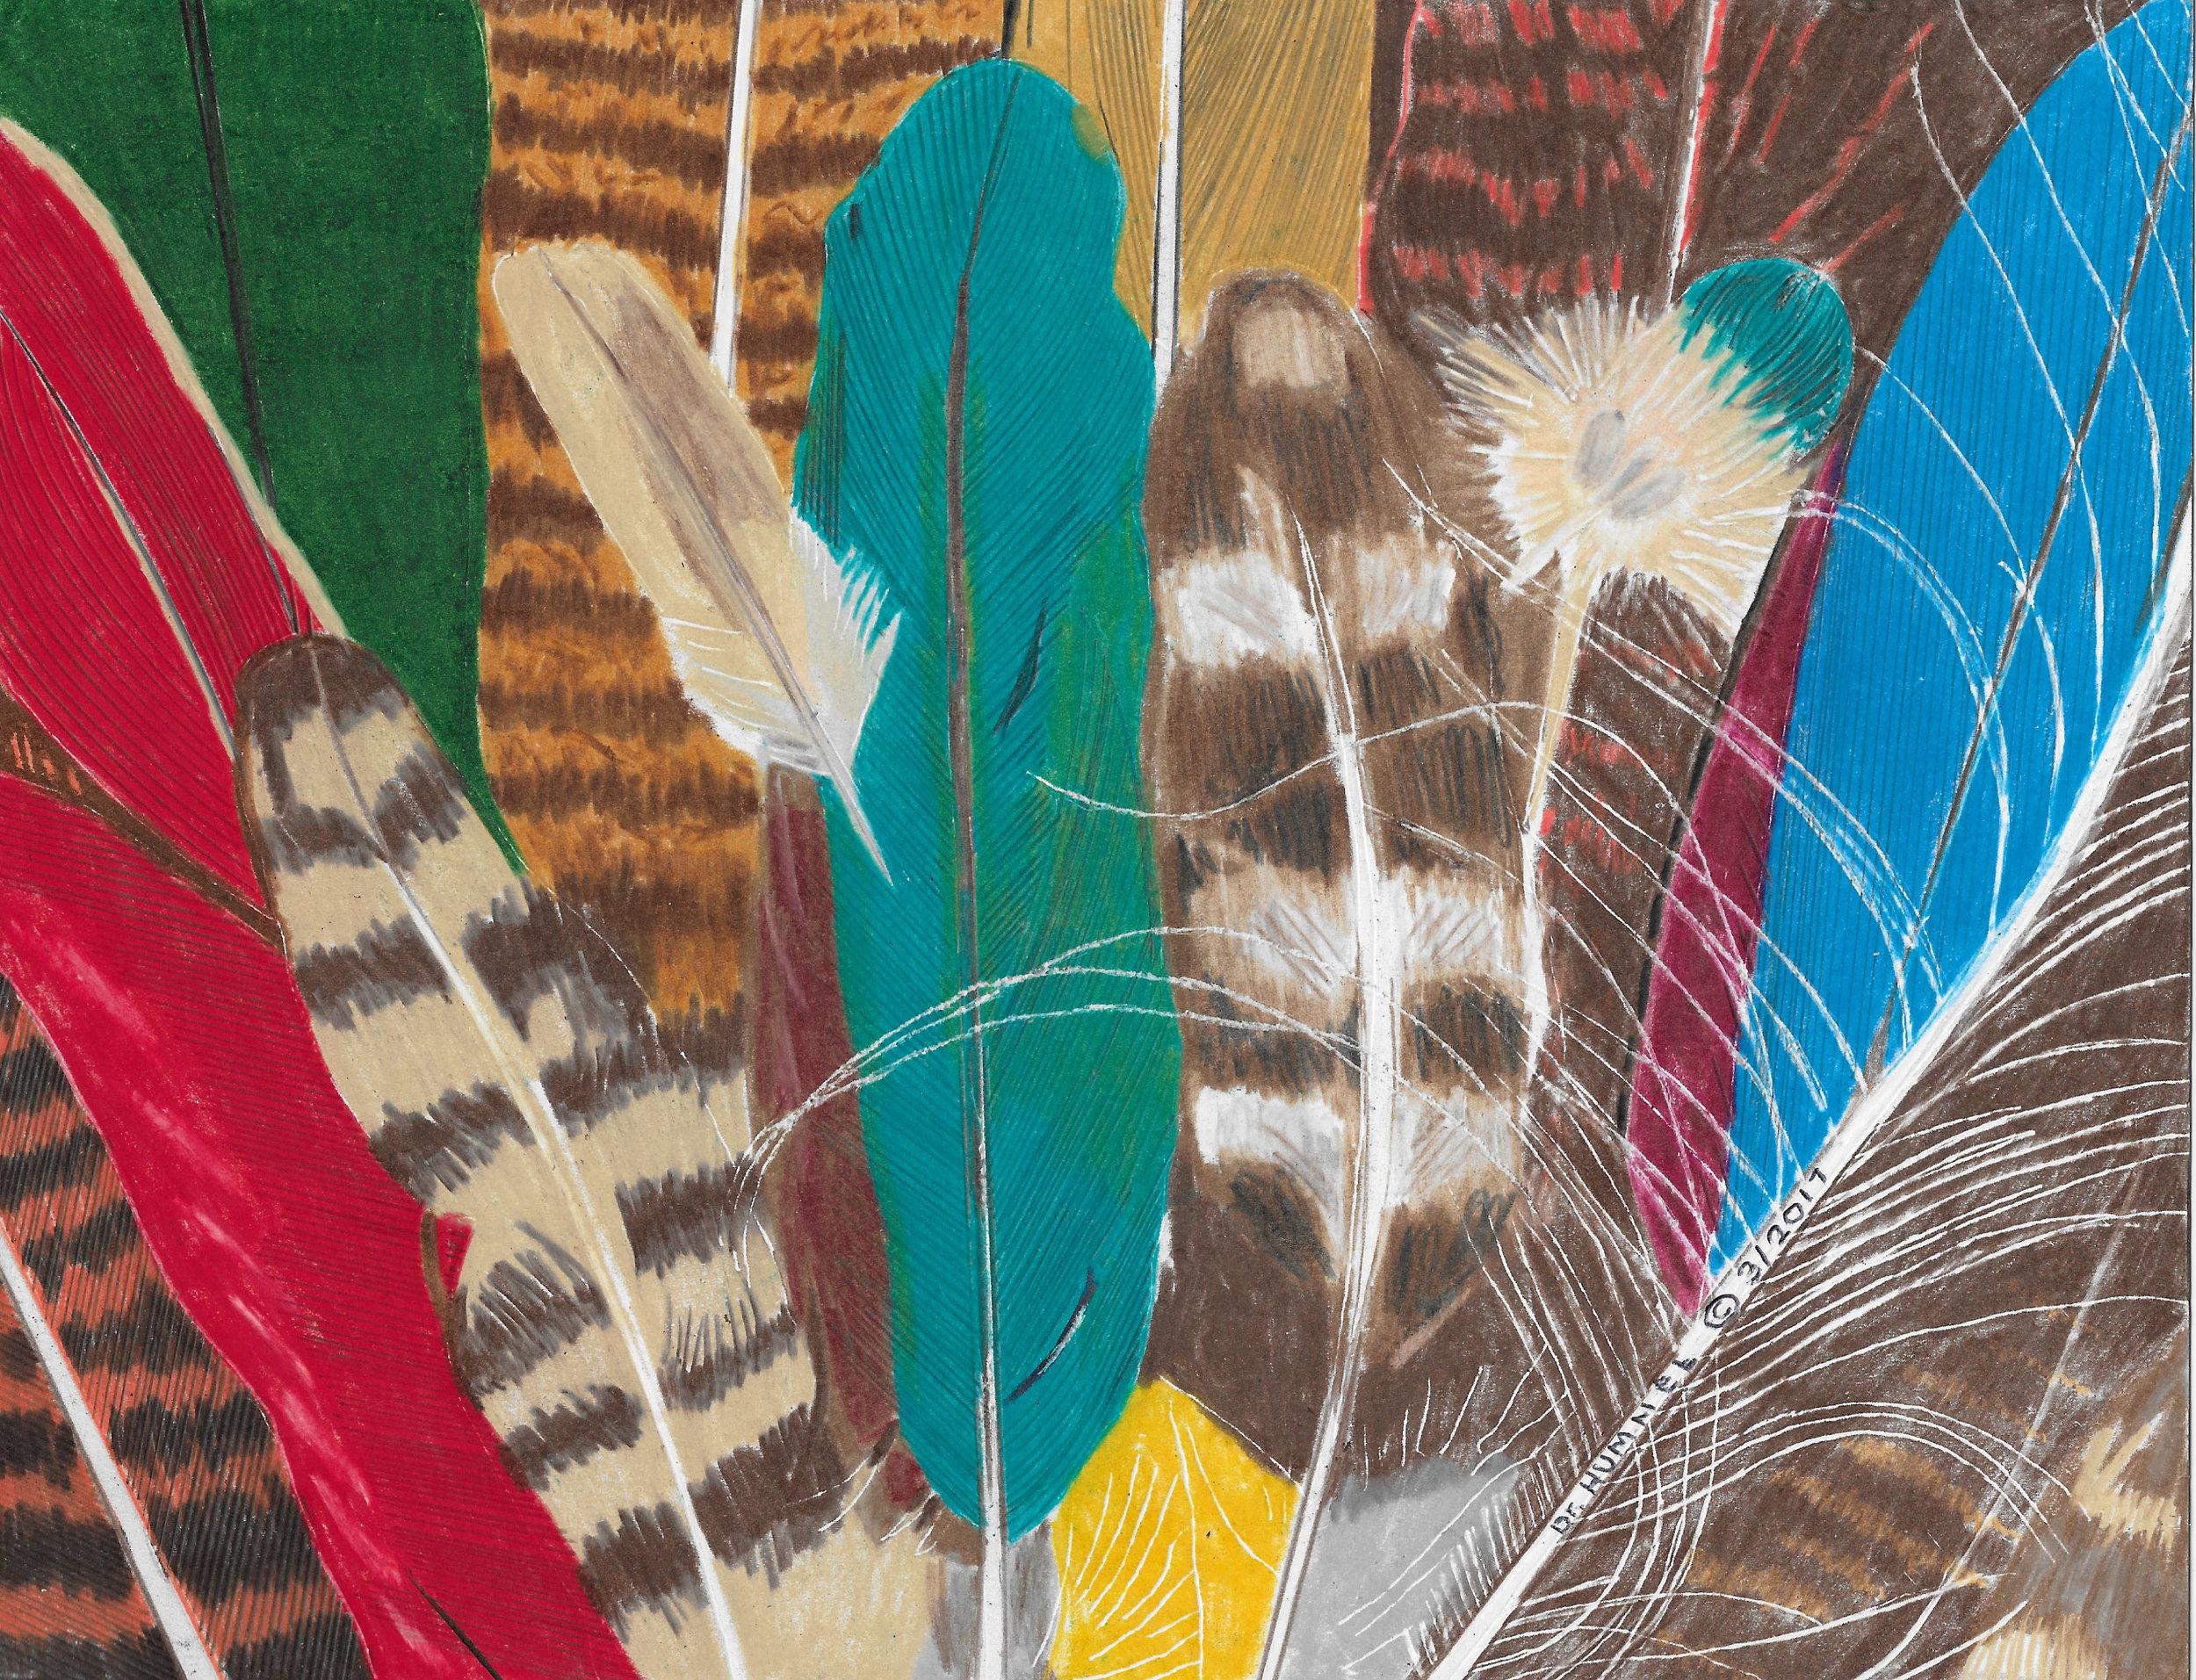 20496926-Feathers.jpg